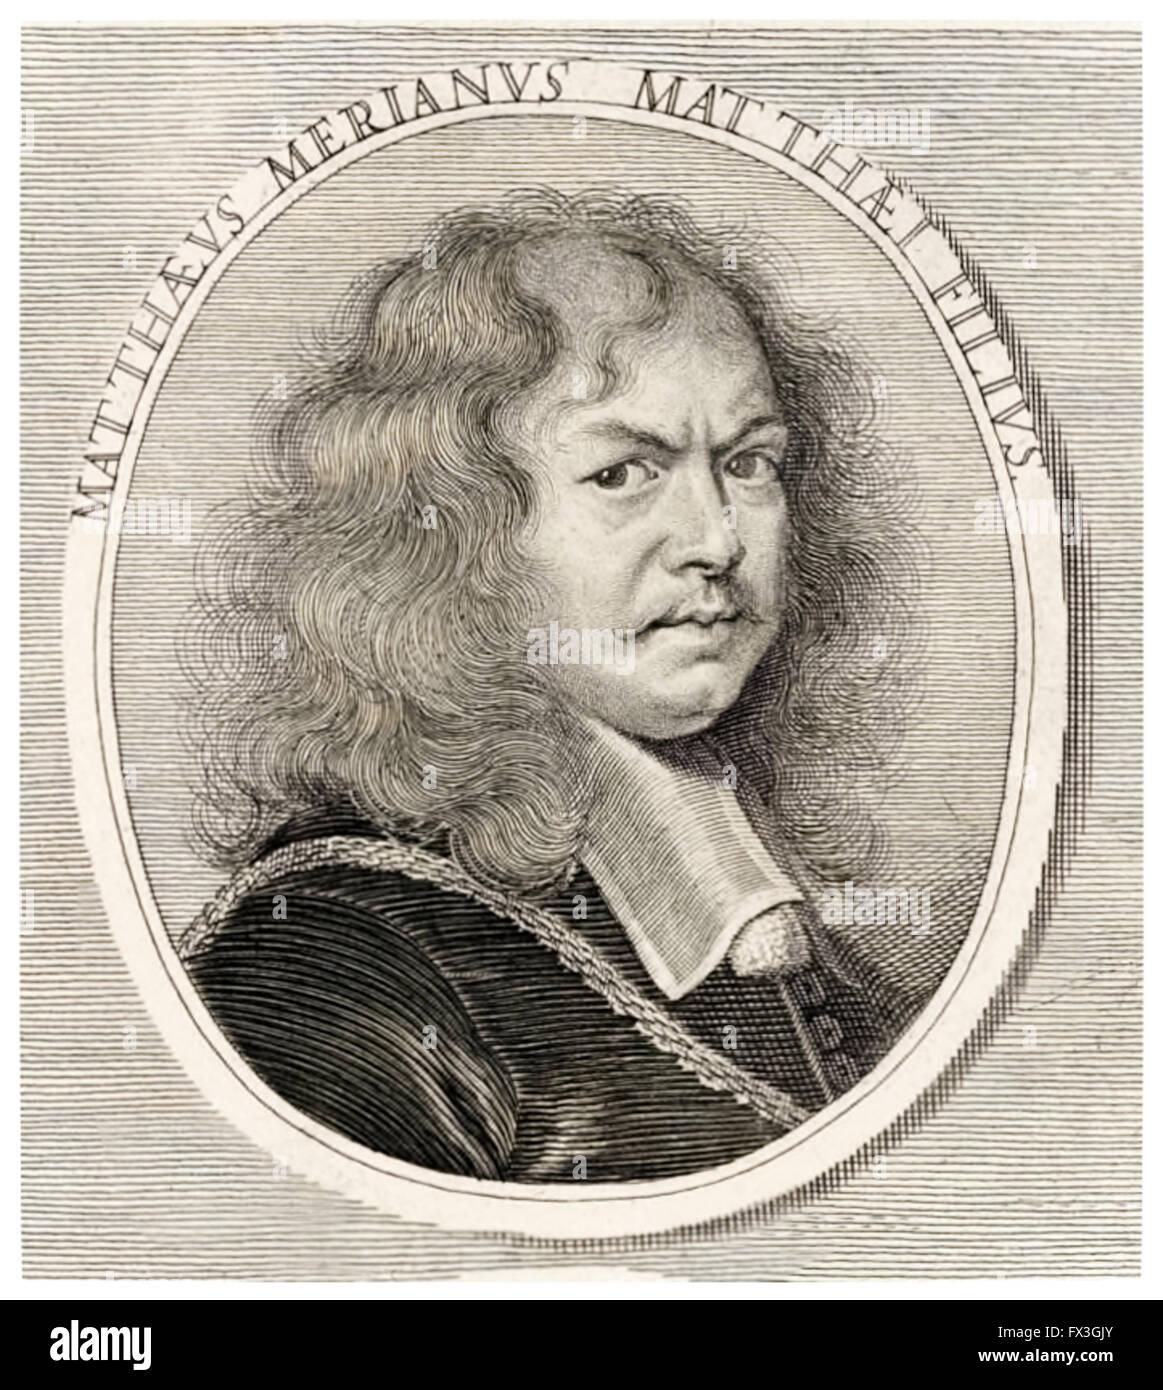 Matthäus Merian the Younger (1621-1687) Swiss engraver (engraving after Joachum von Sandrart). See description for Stock Photo